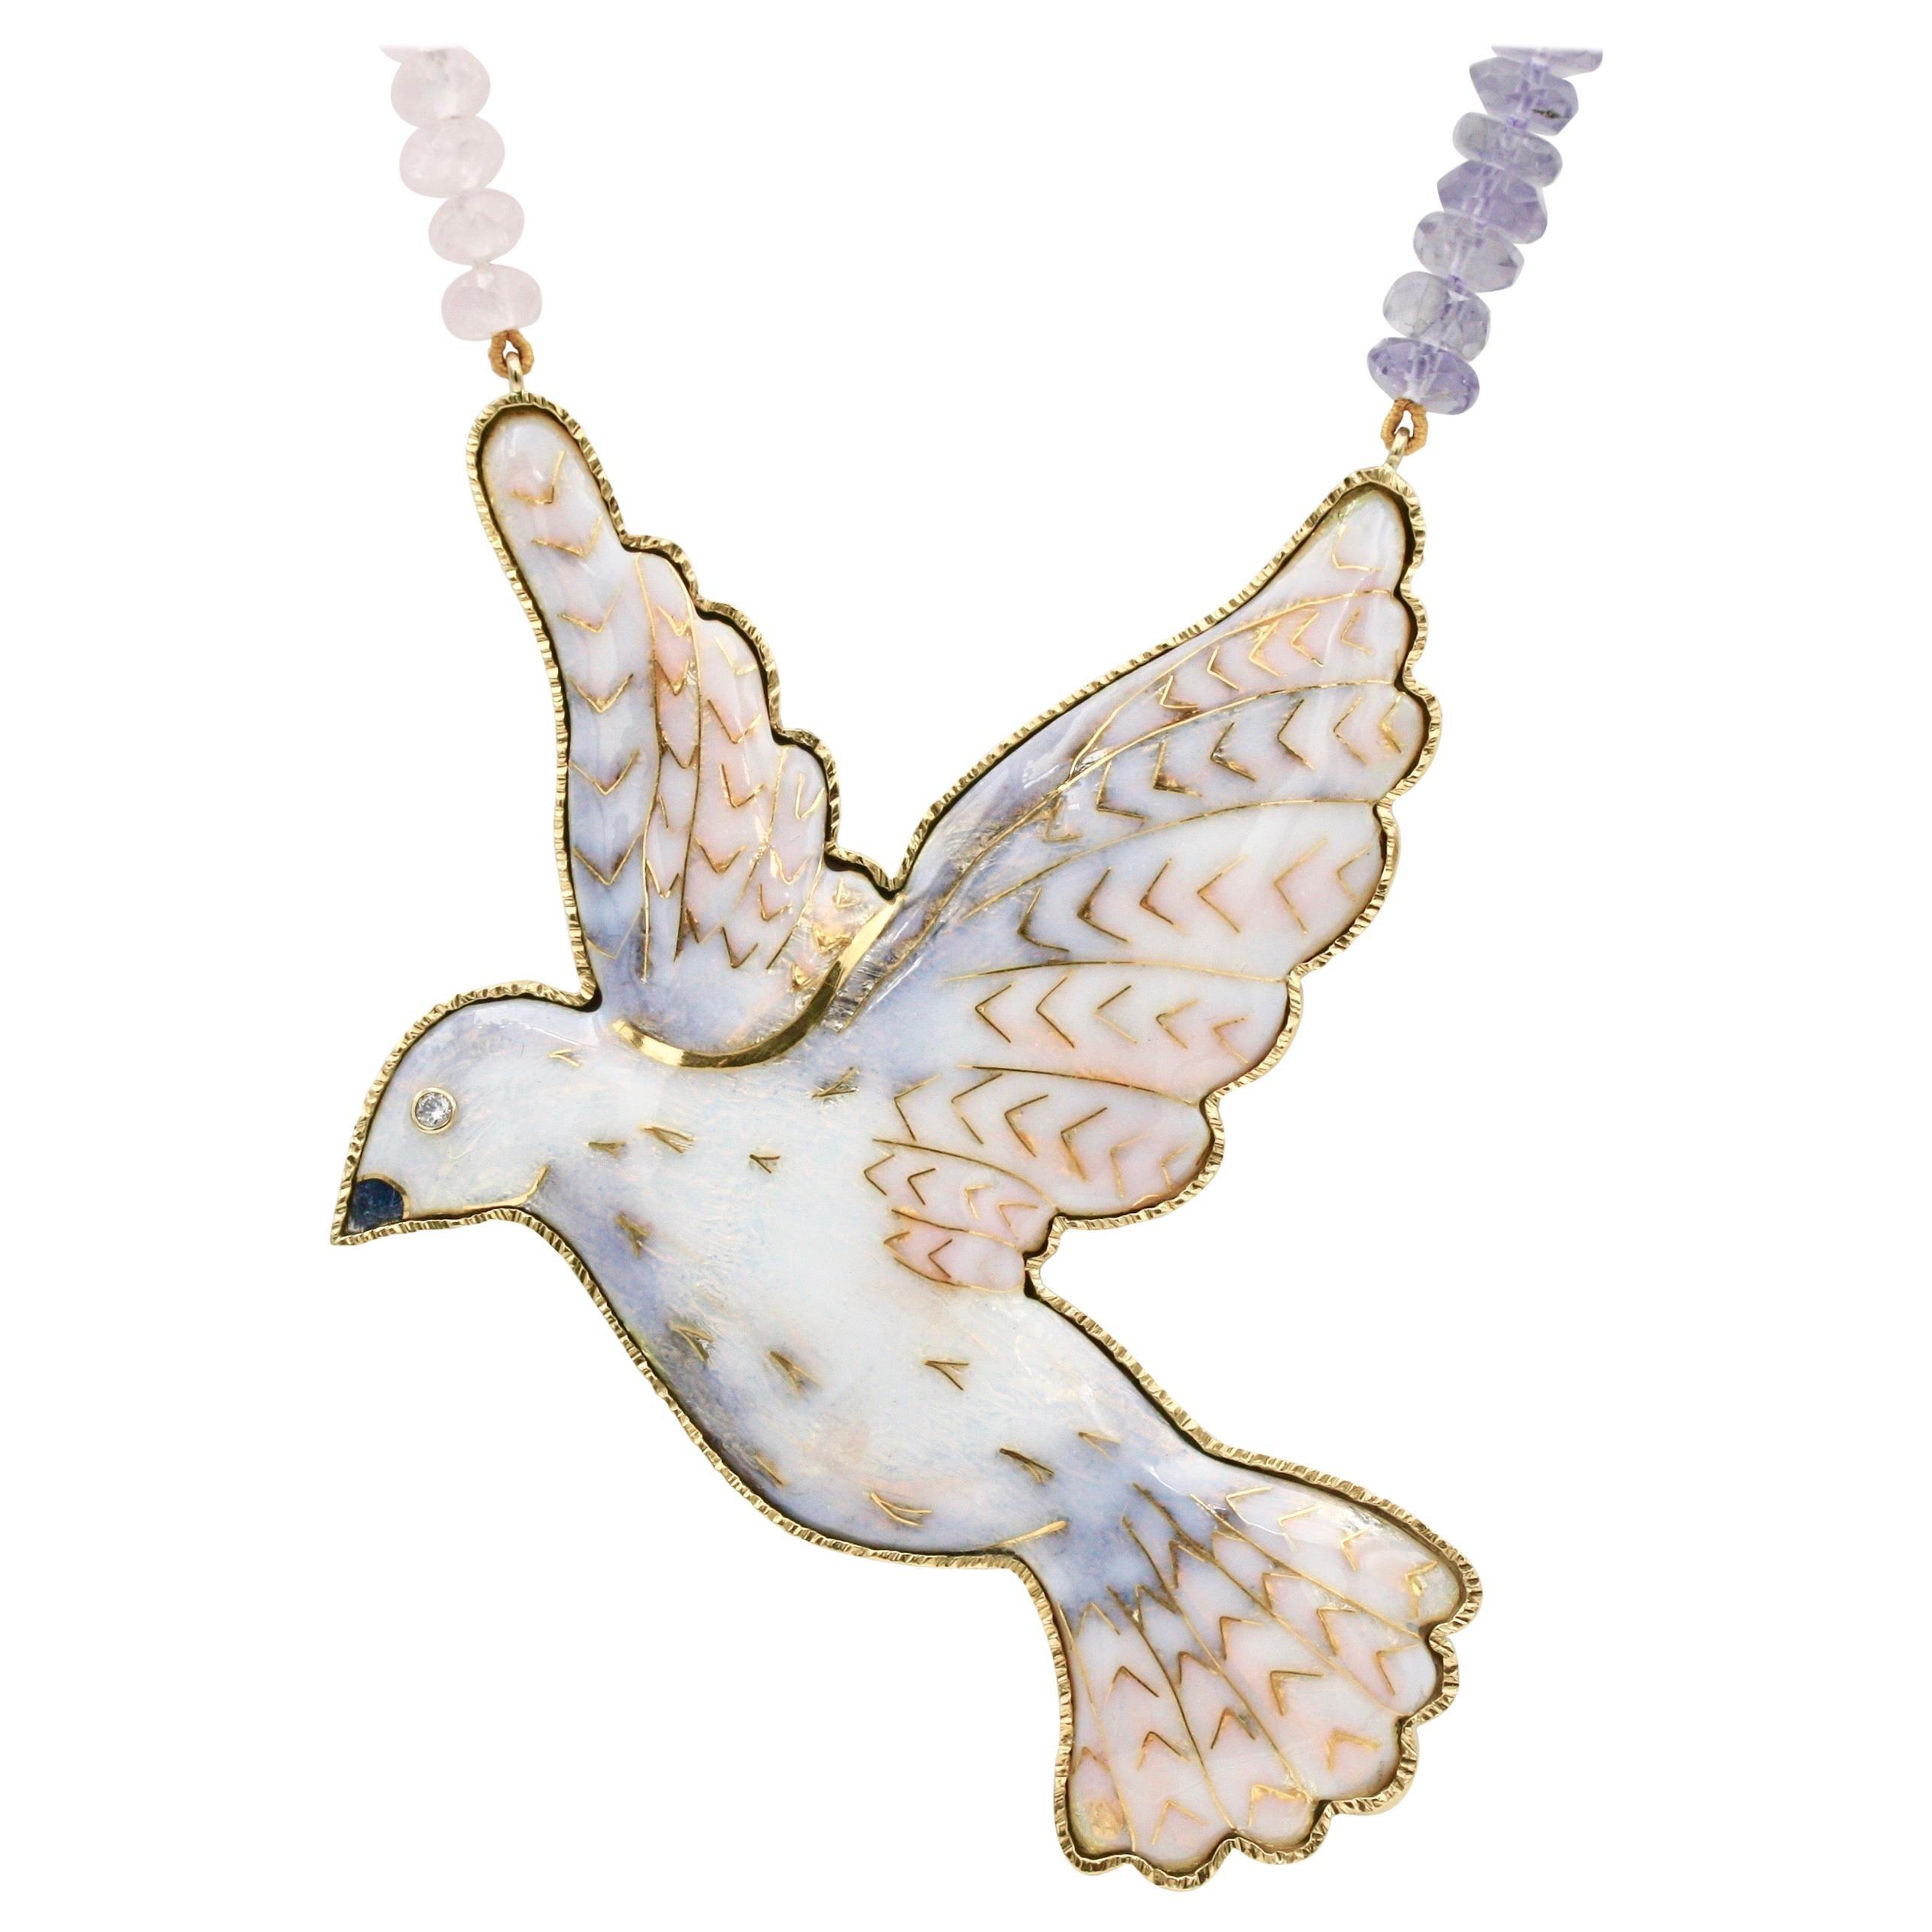 Cloisonné Enamel Dove 24 and 22 Karat Yellow Gold Diamond Necklace